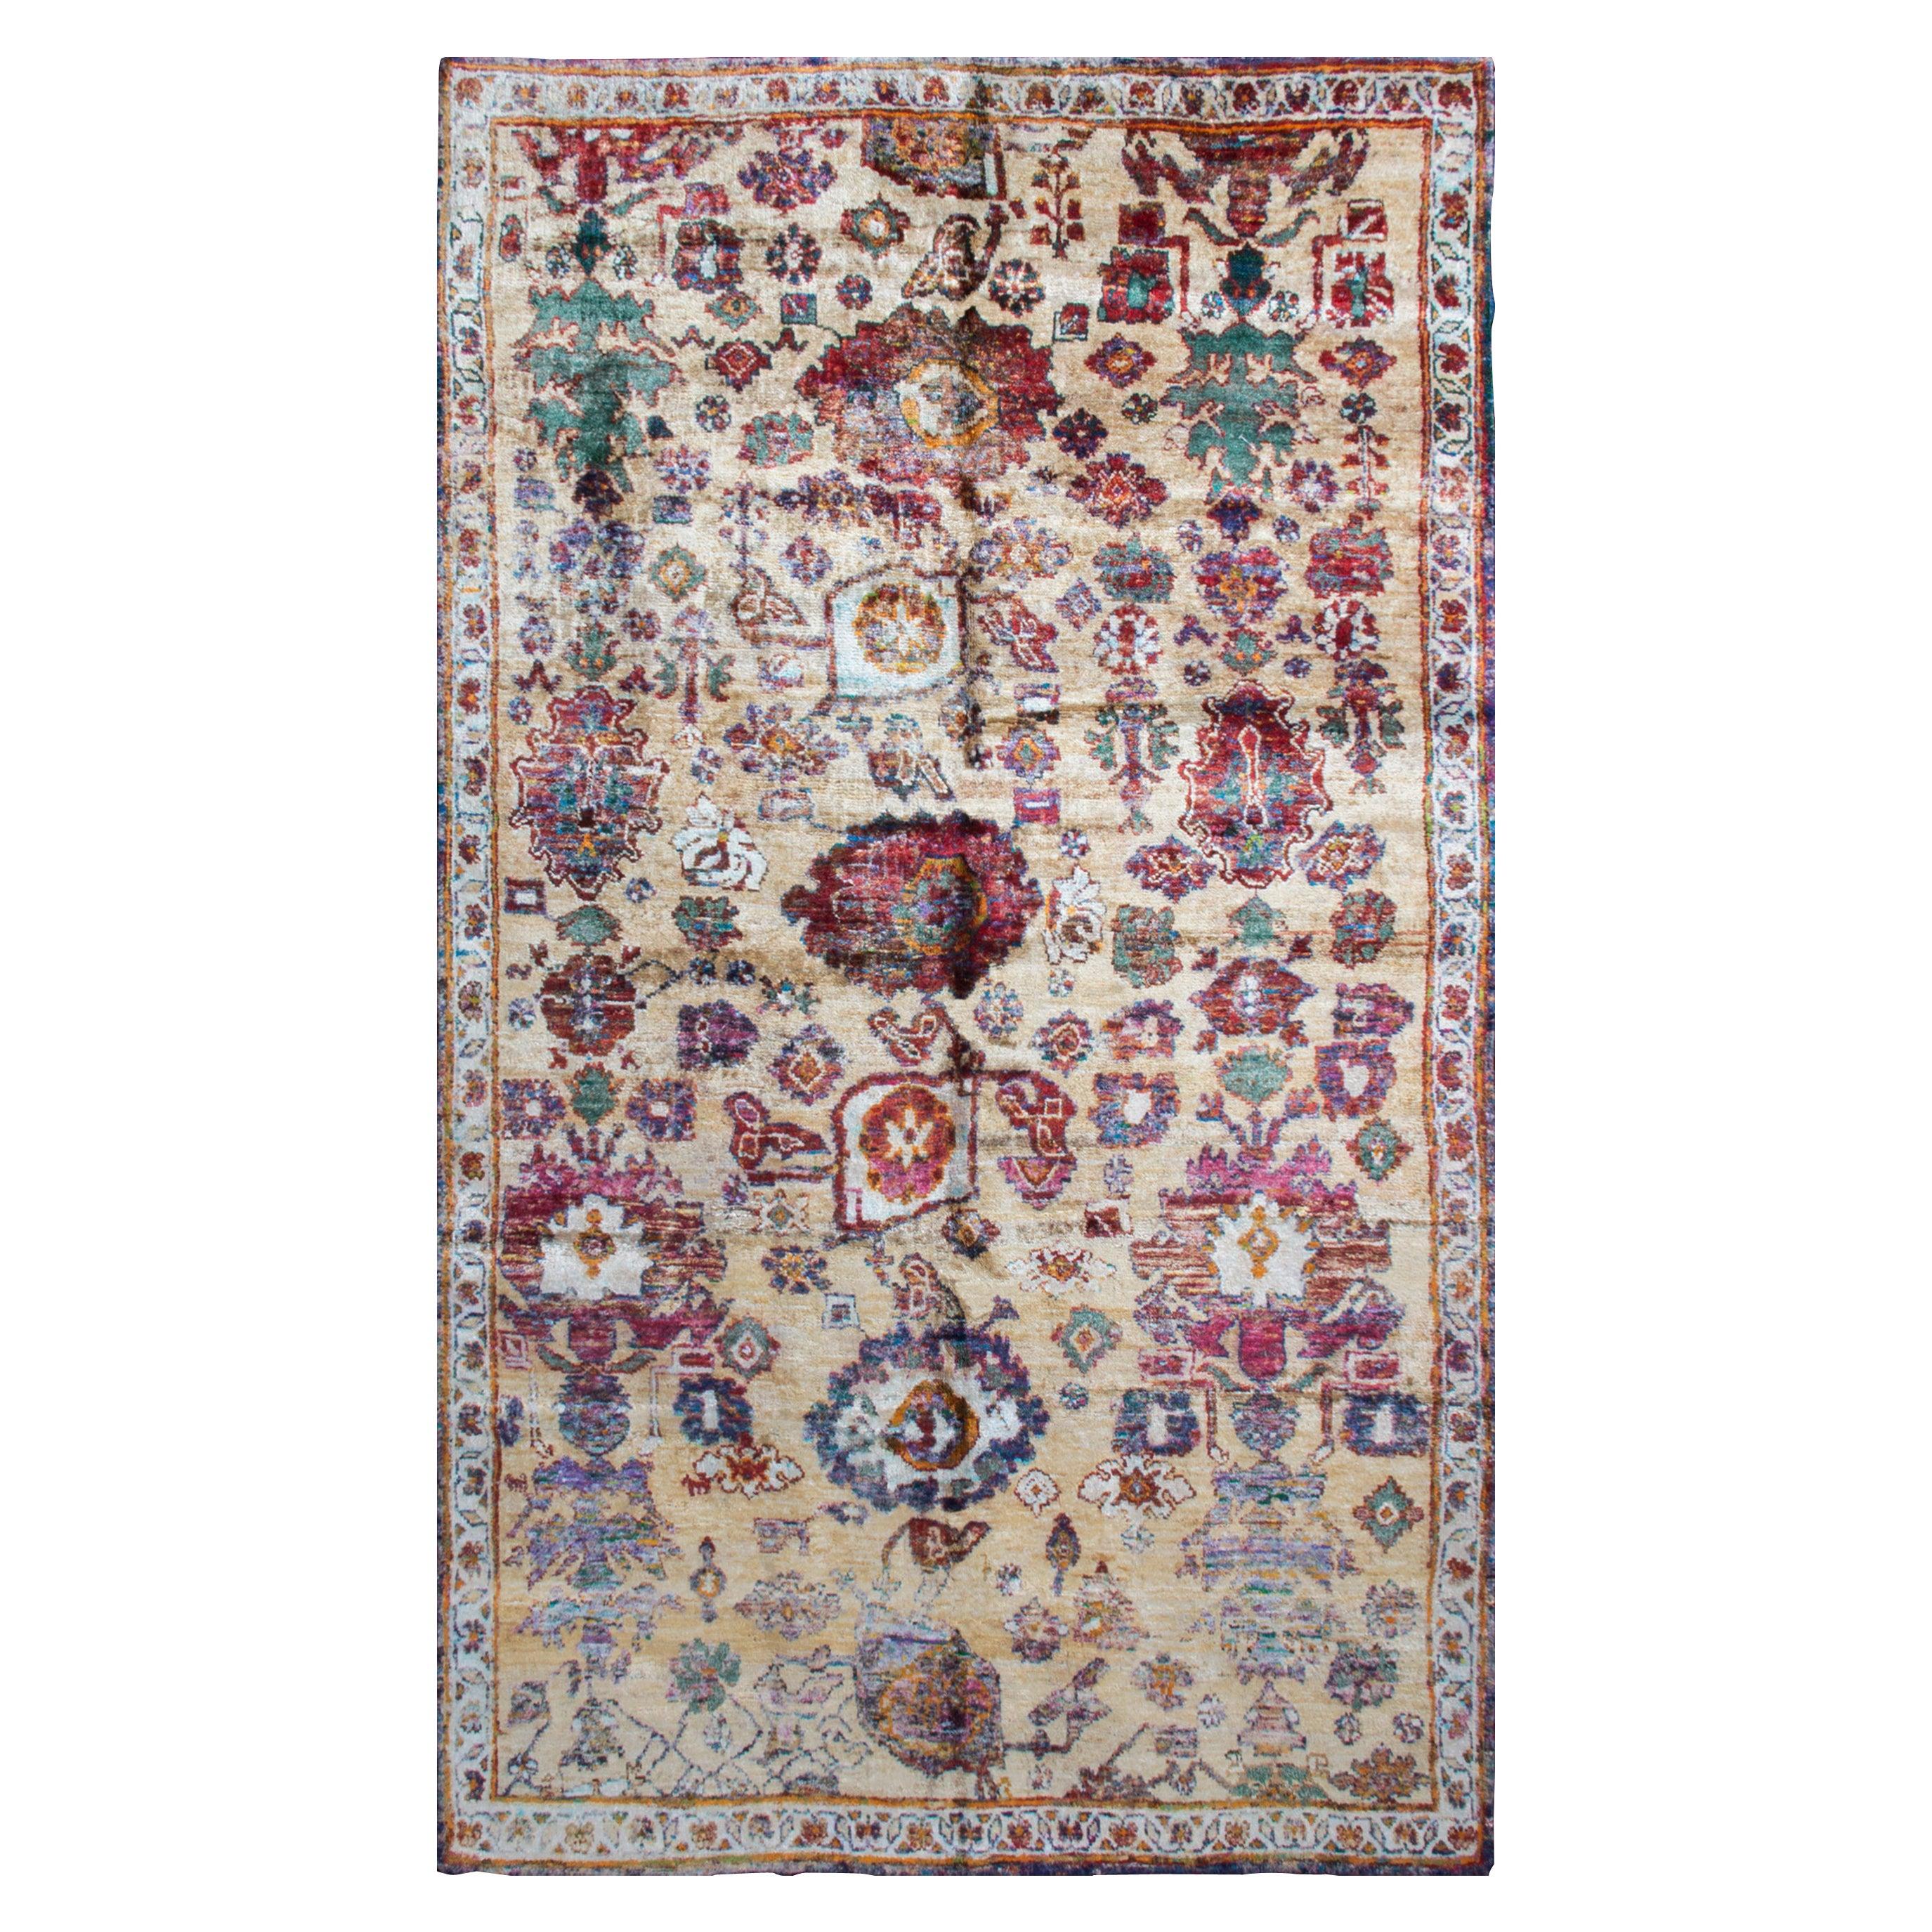 Rug & Kilim's Agra Inspired Multi-Color Wool and Silk Rug